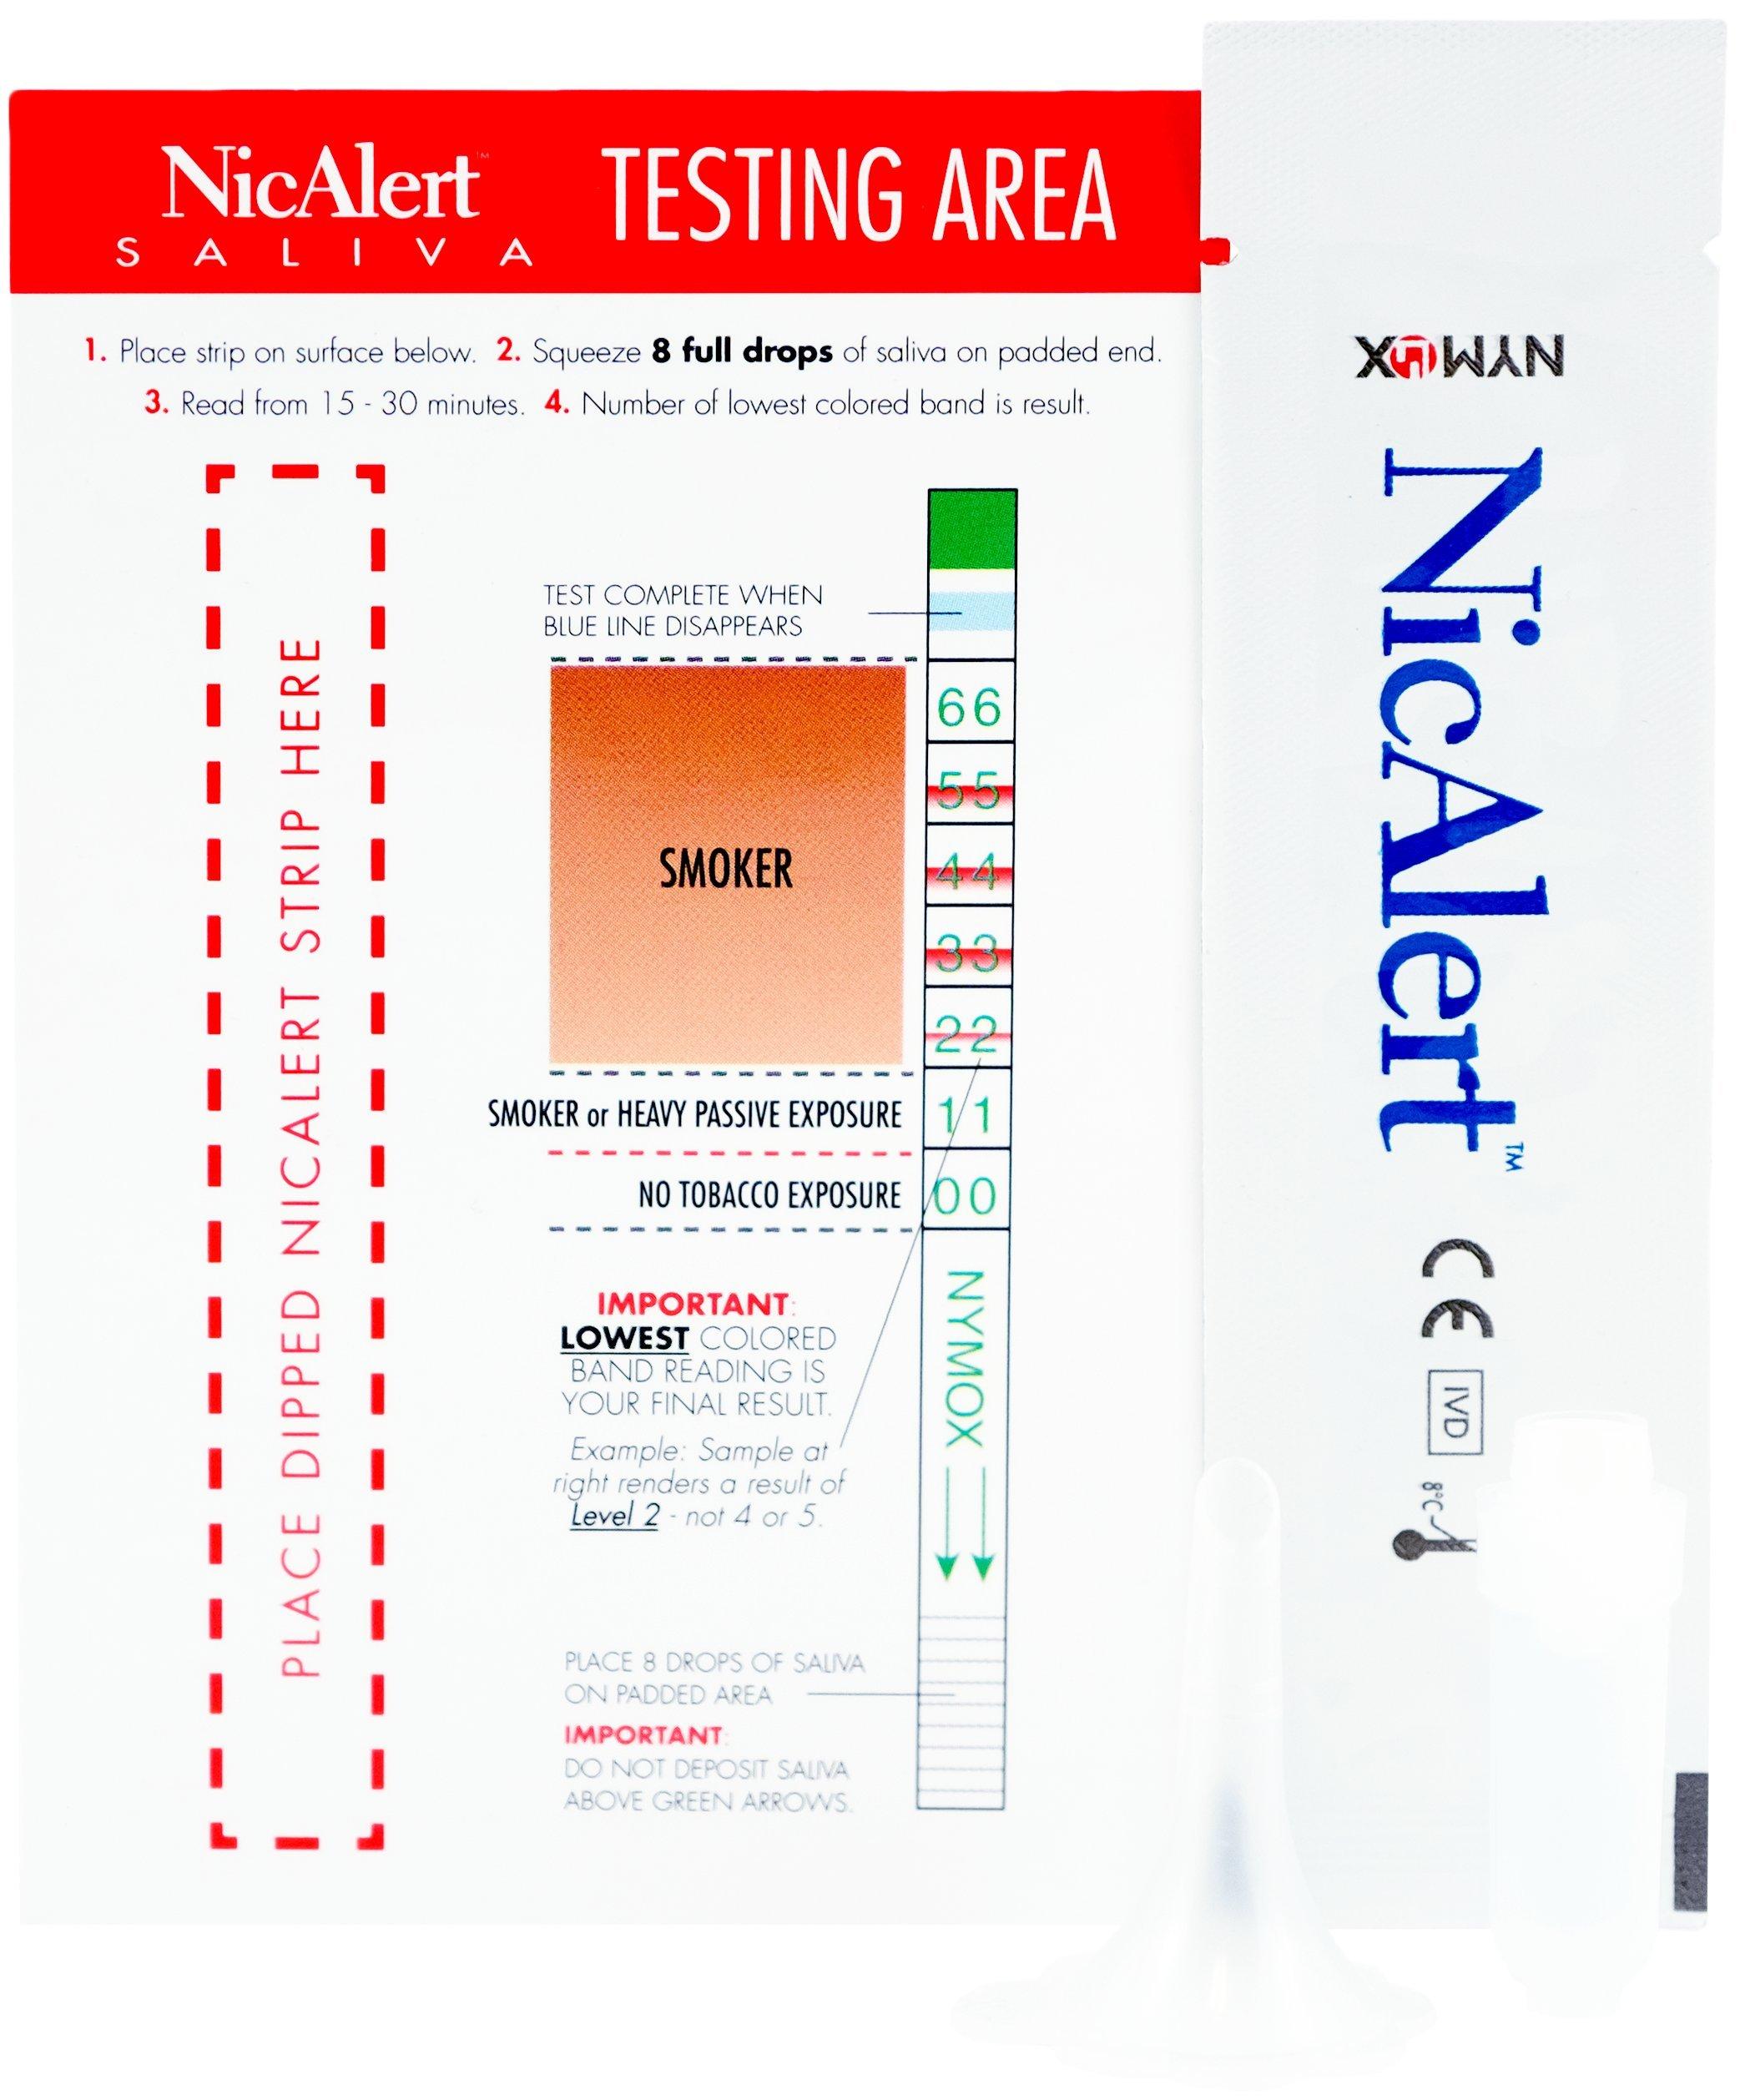 NicAlert Saliva Nicotine Smoking Test with Second Hand Smoke (1 Test)